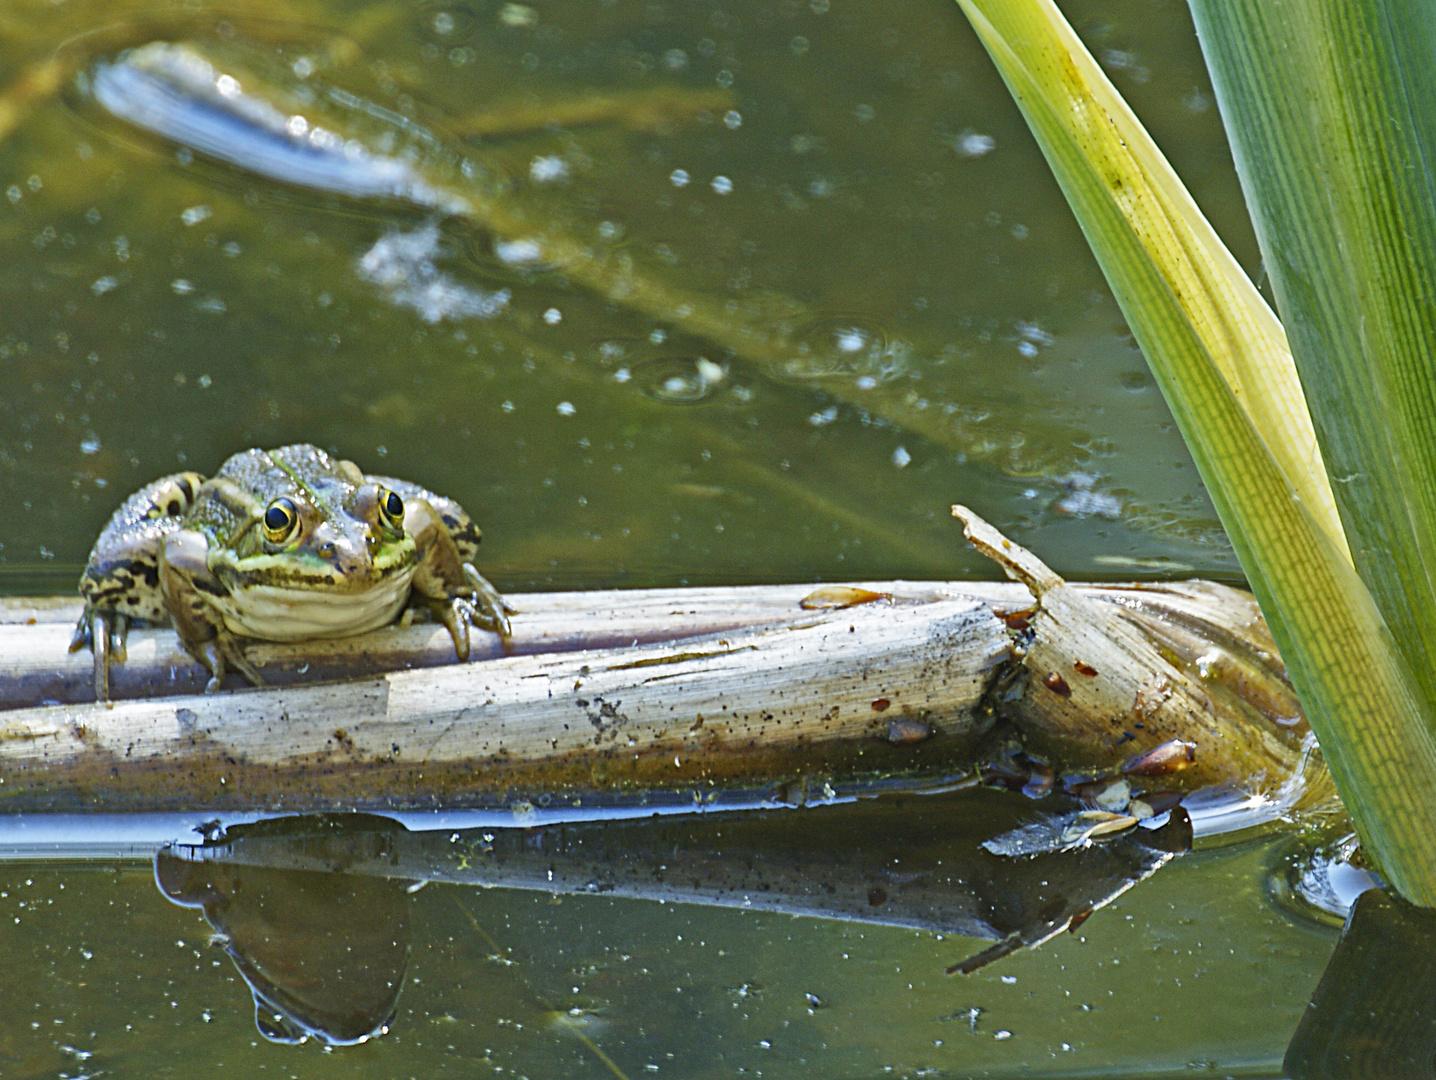 grenouille verte (Rana Kl esculenta)